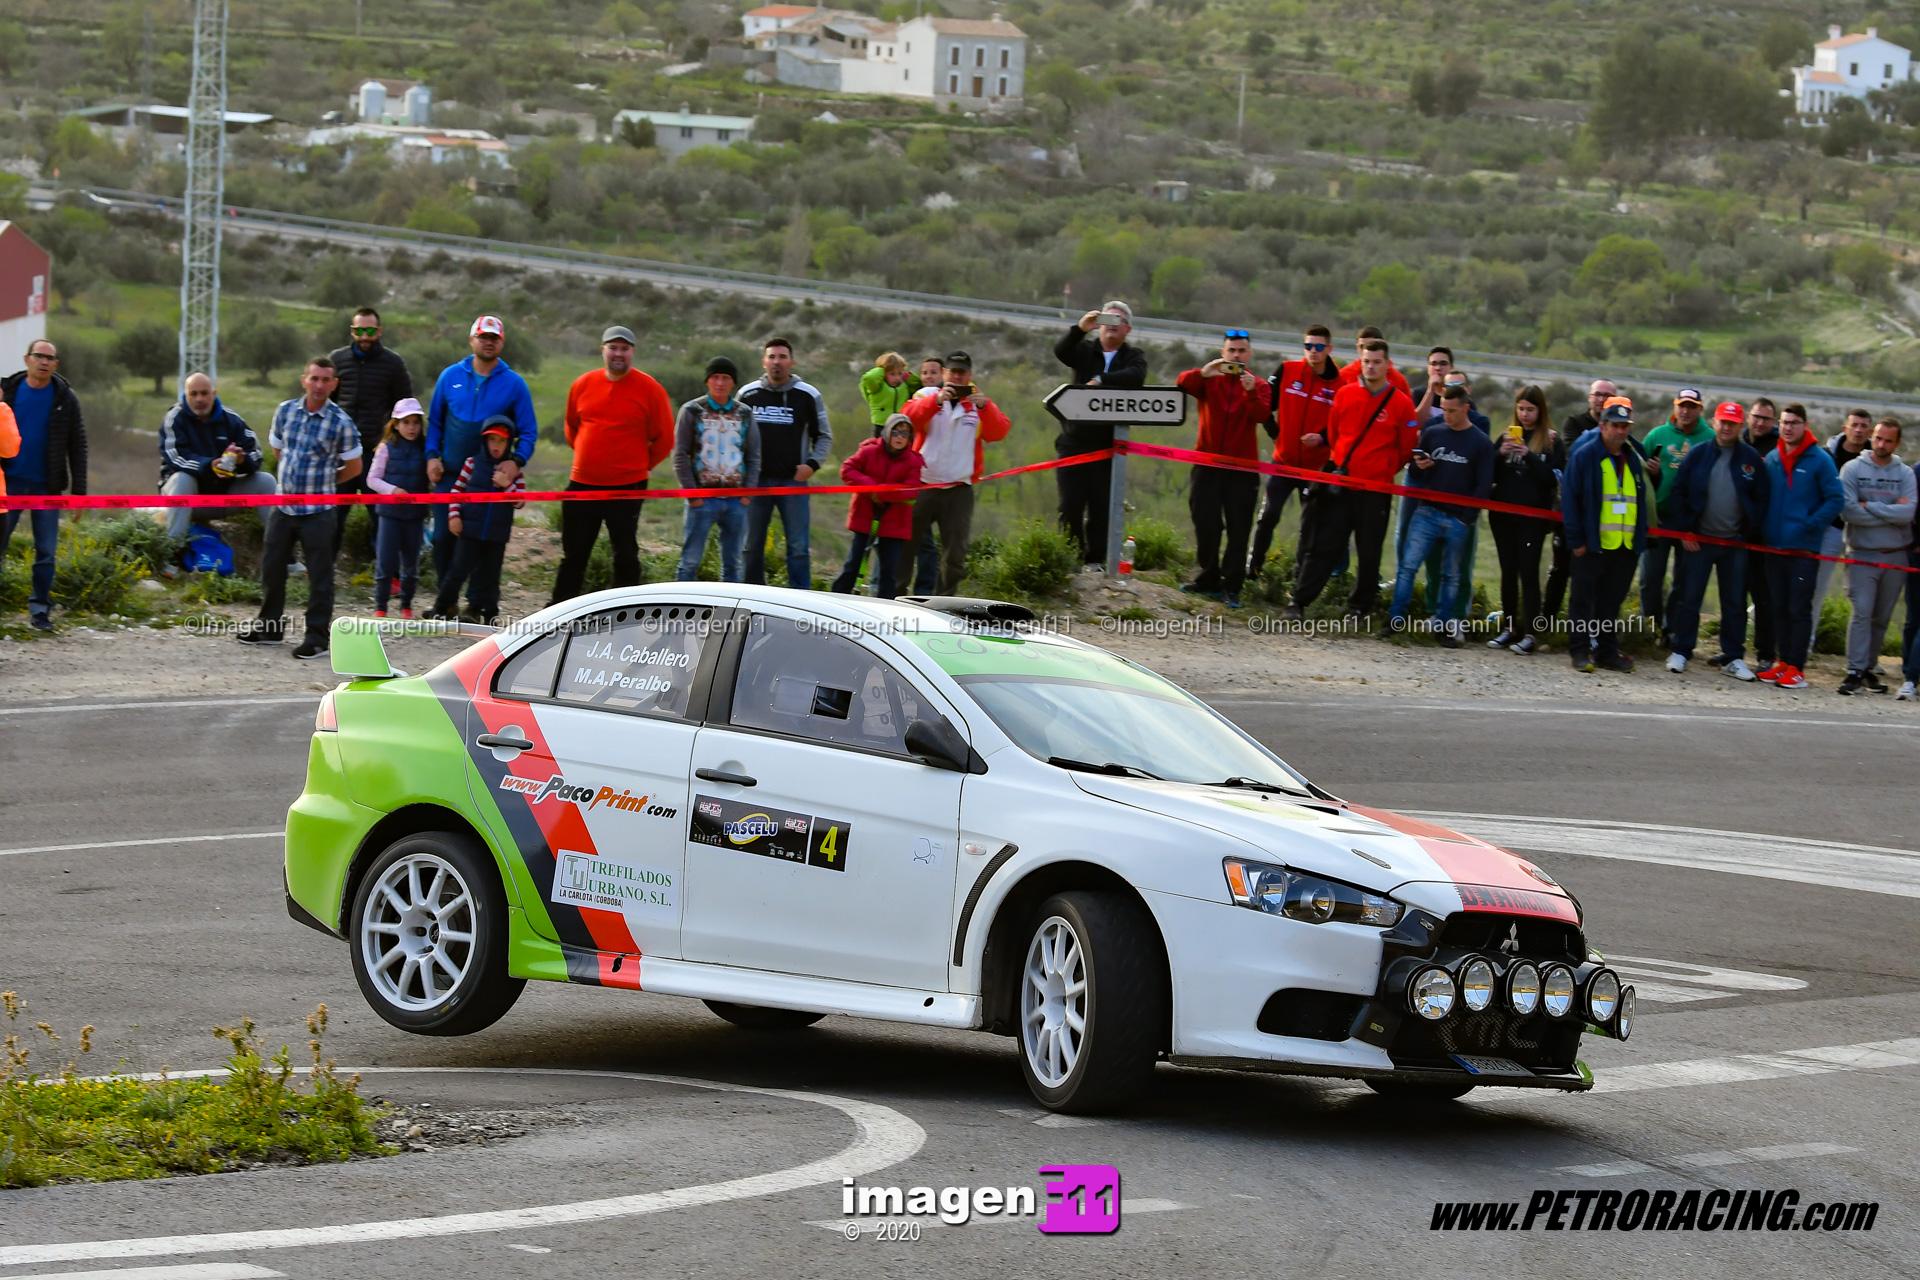 Jose Antonio Caballero, Mitsubishi Lancer EVO X, Rallye Valle del Almanzora